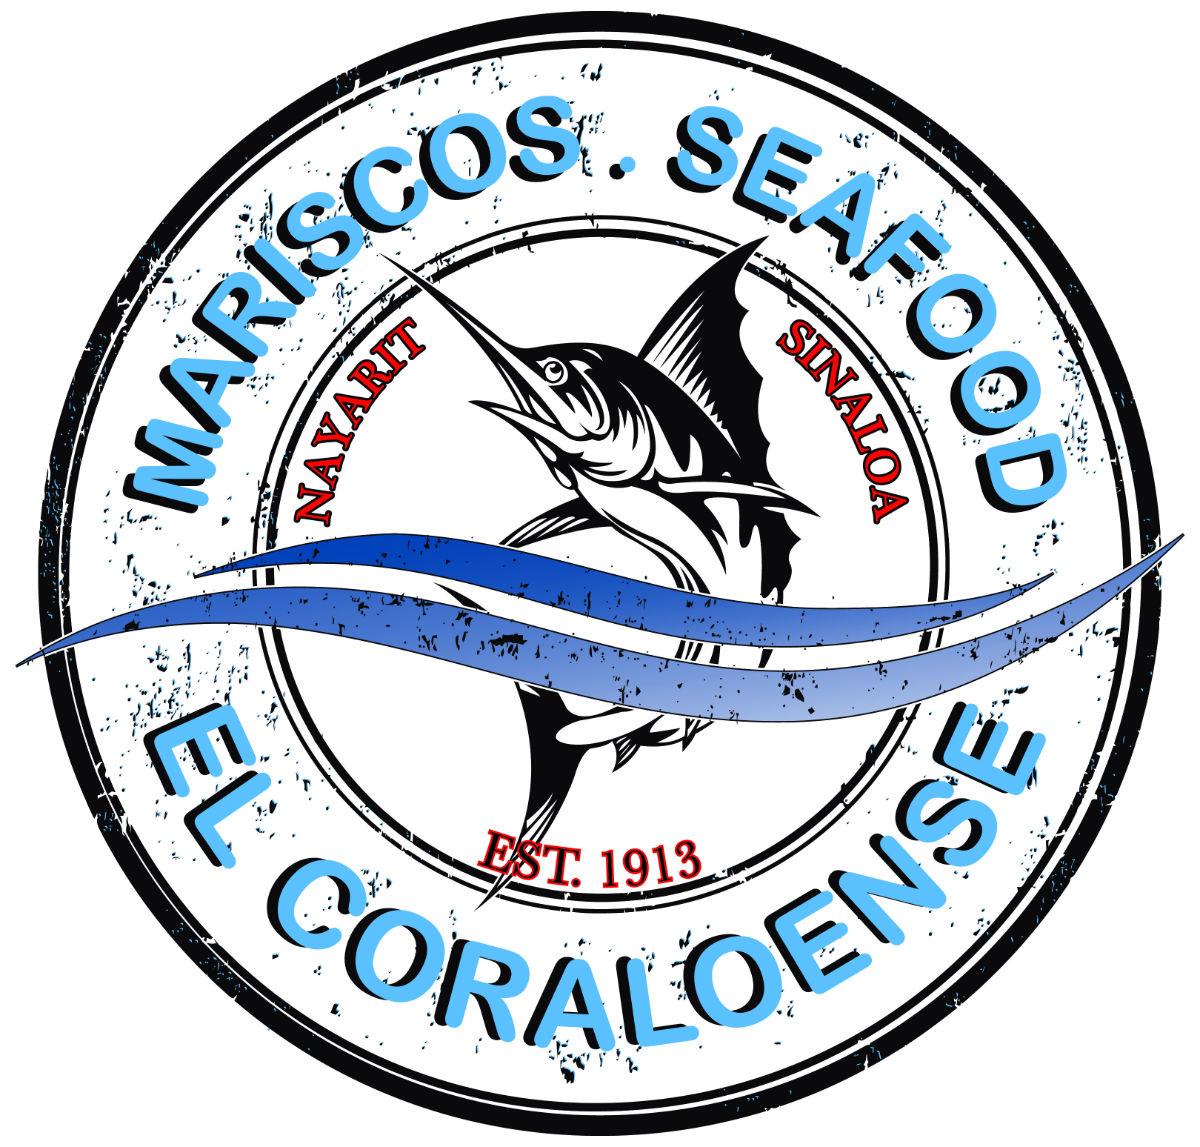 Coraloense logo